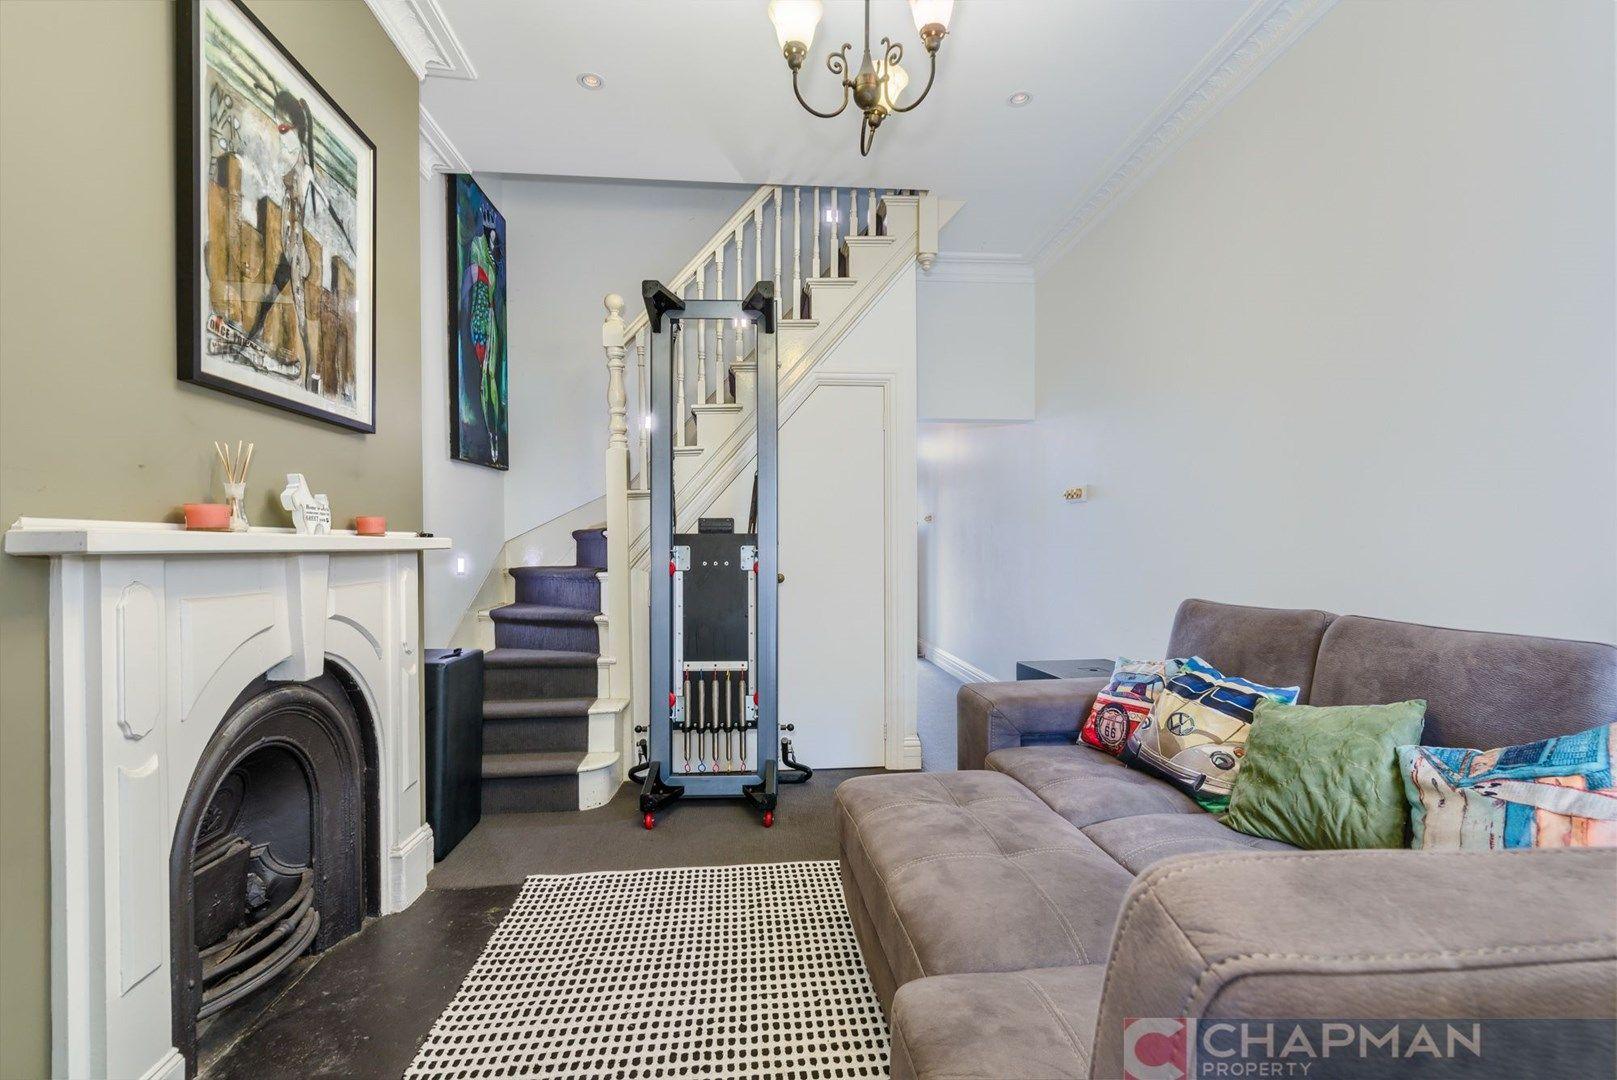 17 Beach Street, Newcastle East NSW 2300 - Terrace Property For Sale ...